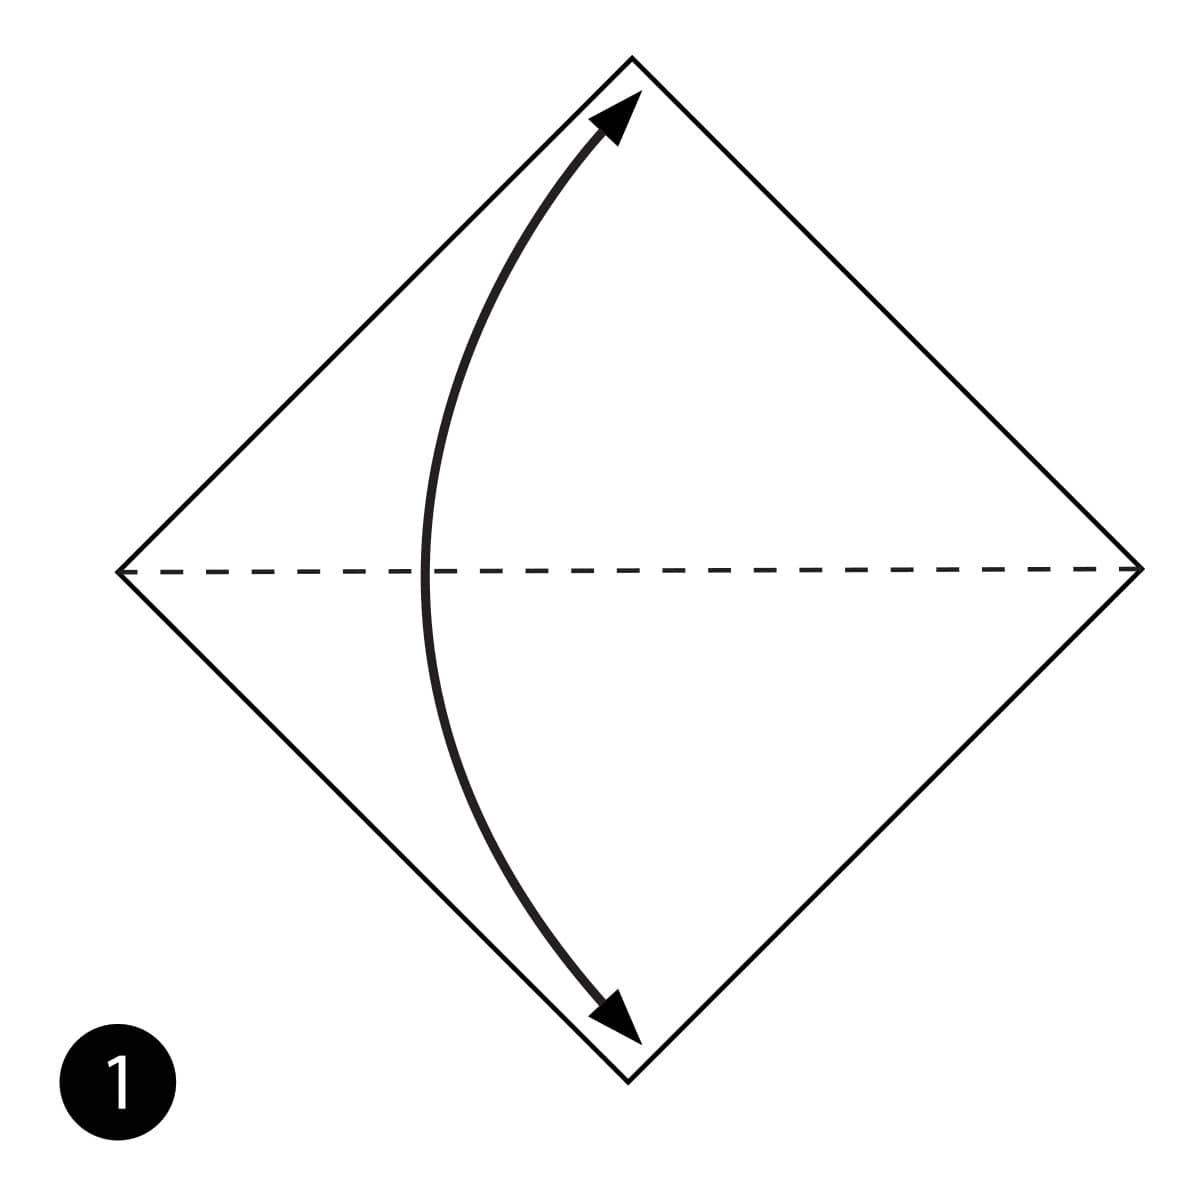 Fabulous origami swans | Origami swan instructions, Origami swan ... | 1200x1200